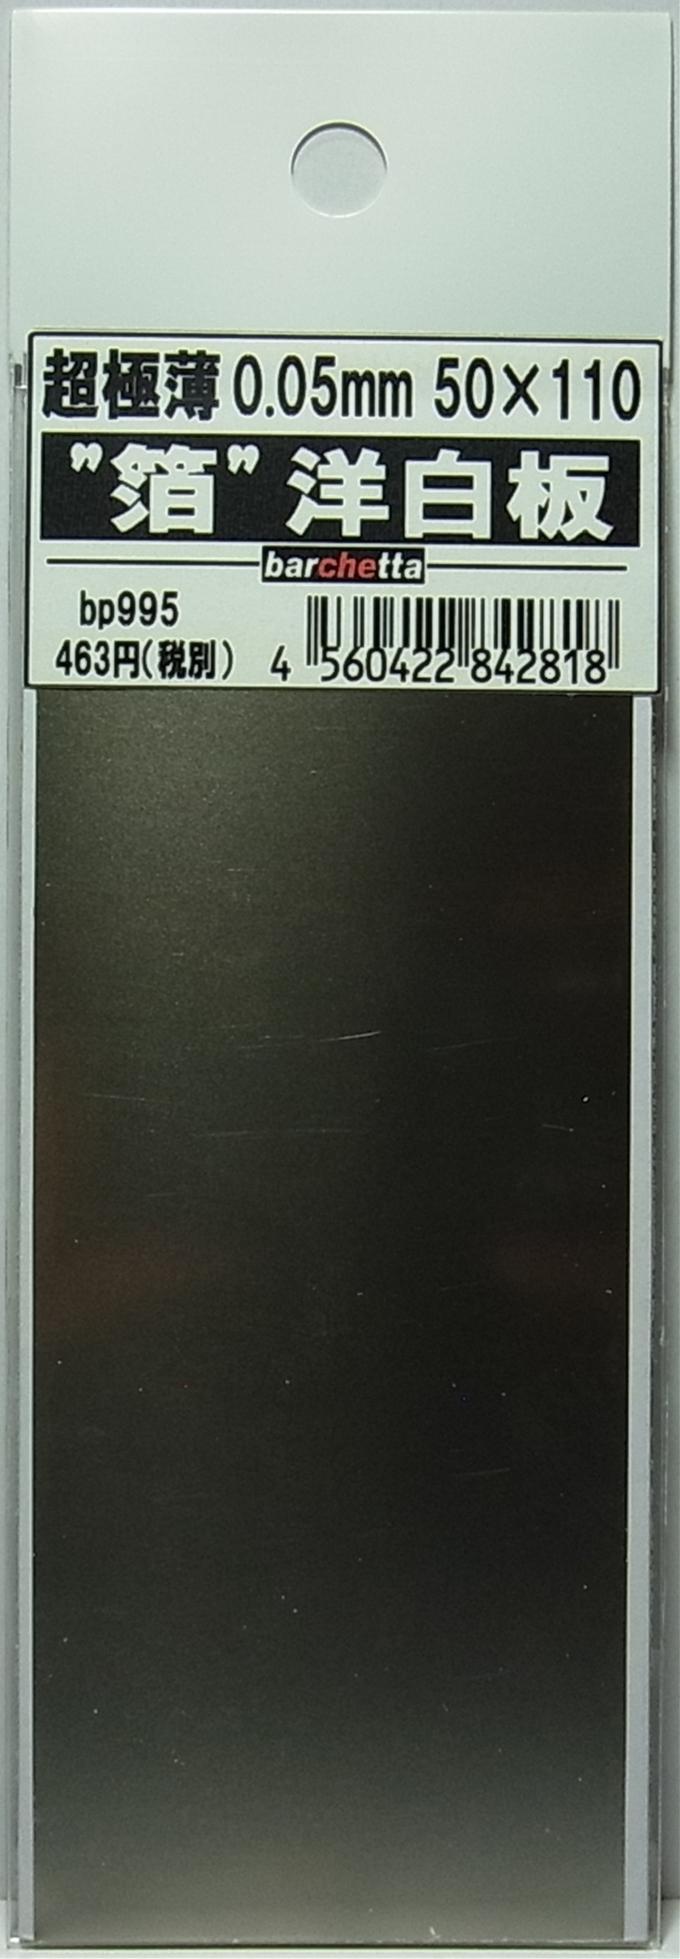 "bp995  超極薄 ""箔"" 洋白板 厚さ0.05.mm 50×110  使い方色々 自由自在"